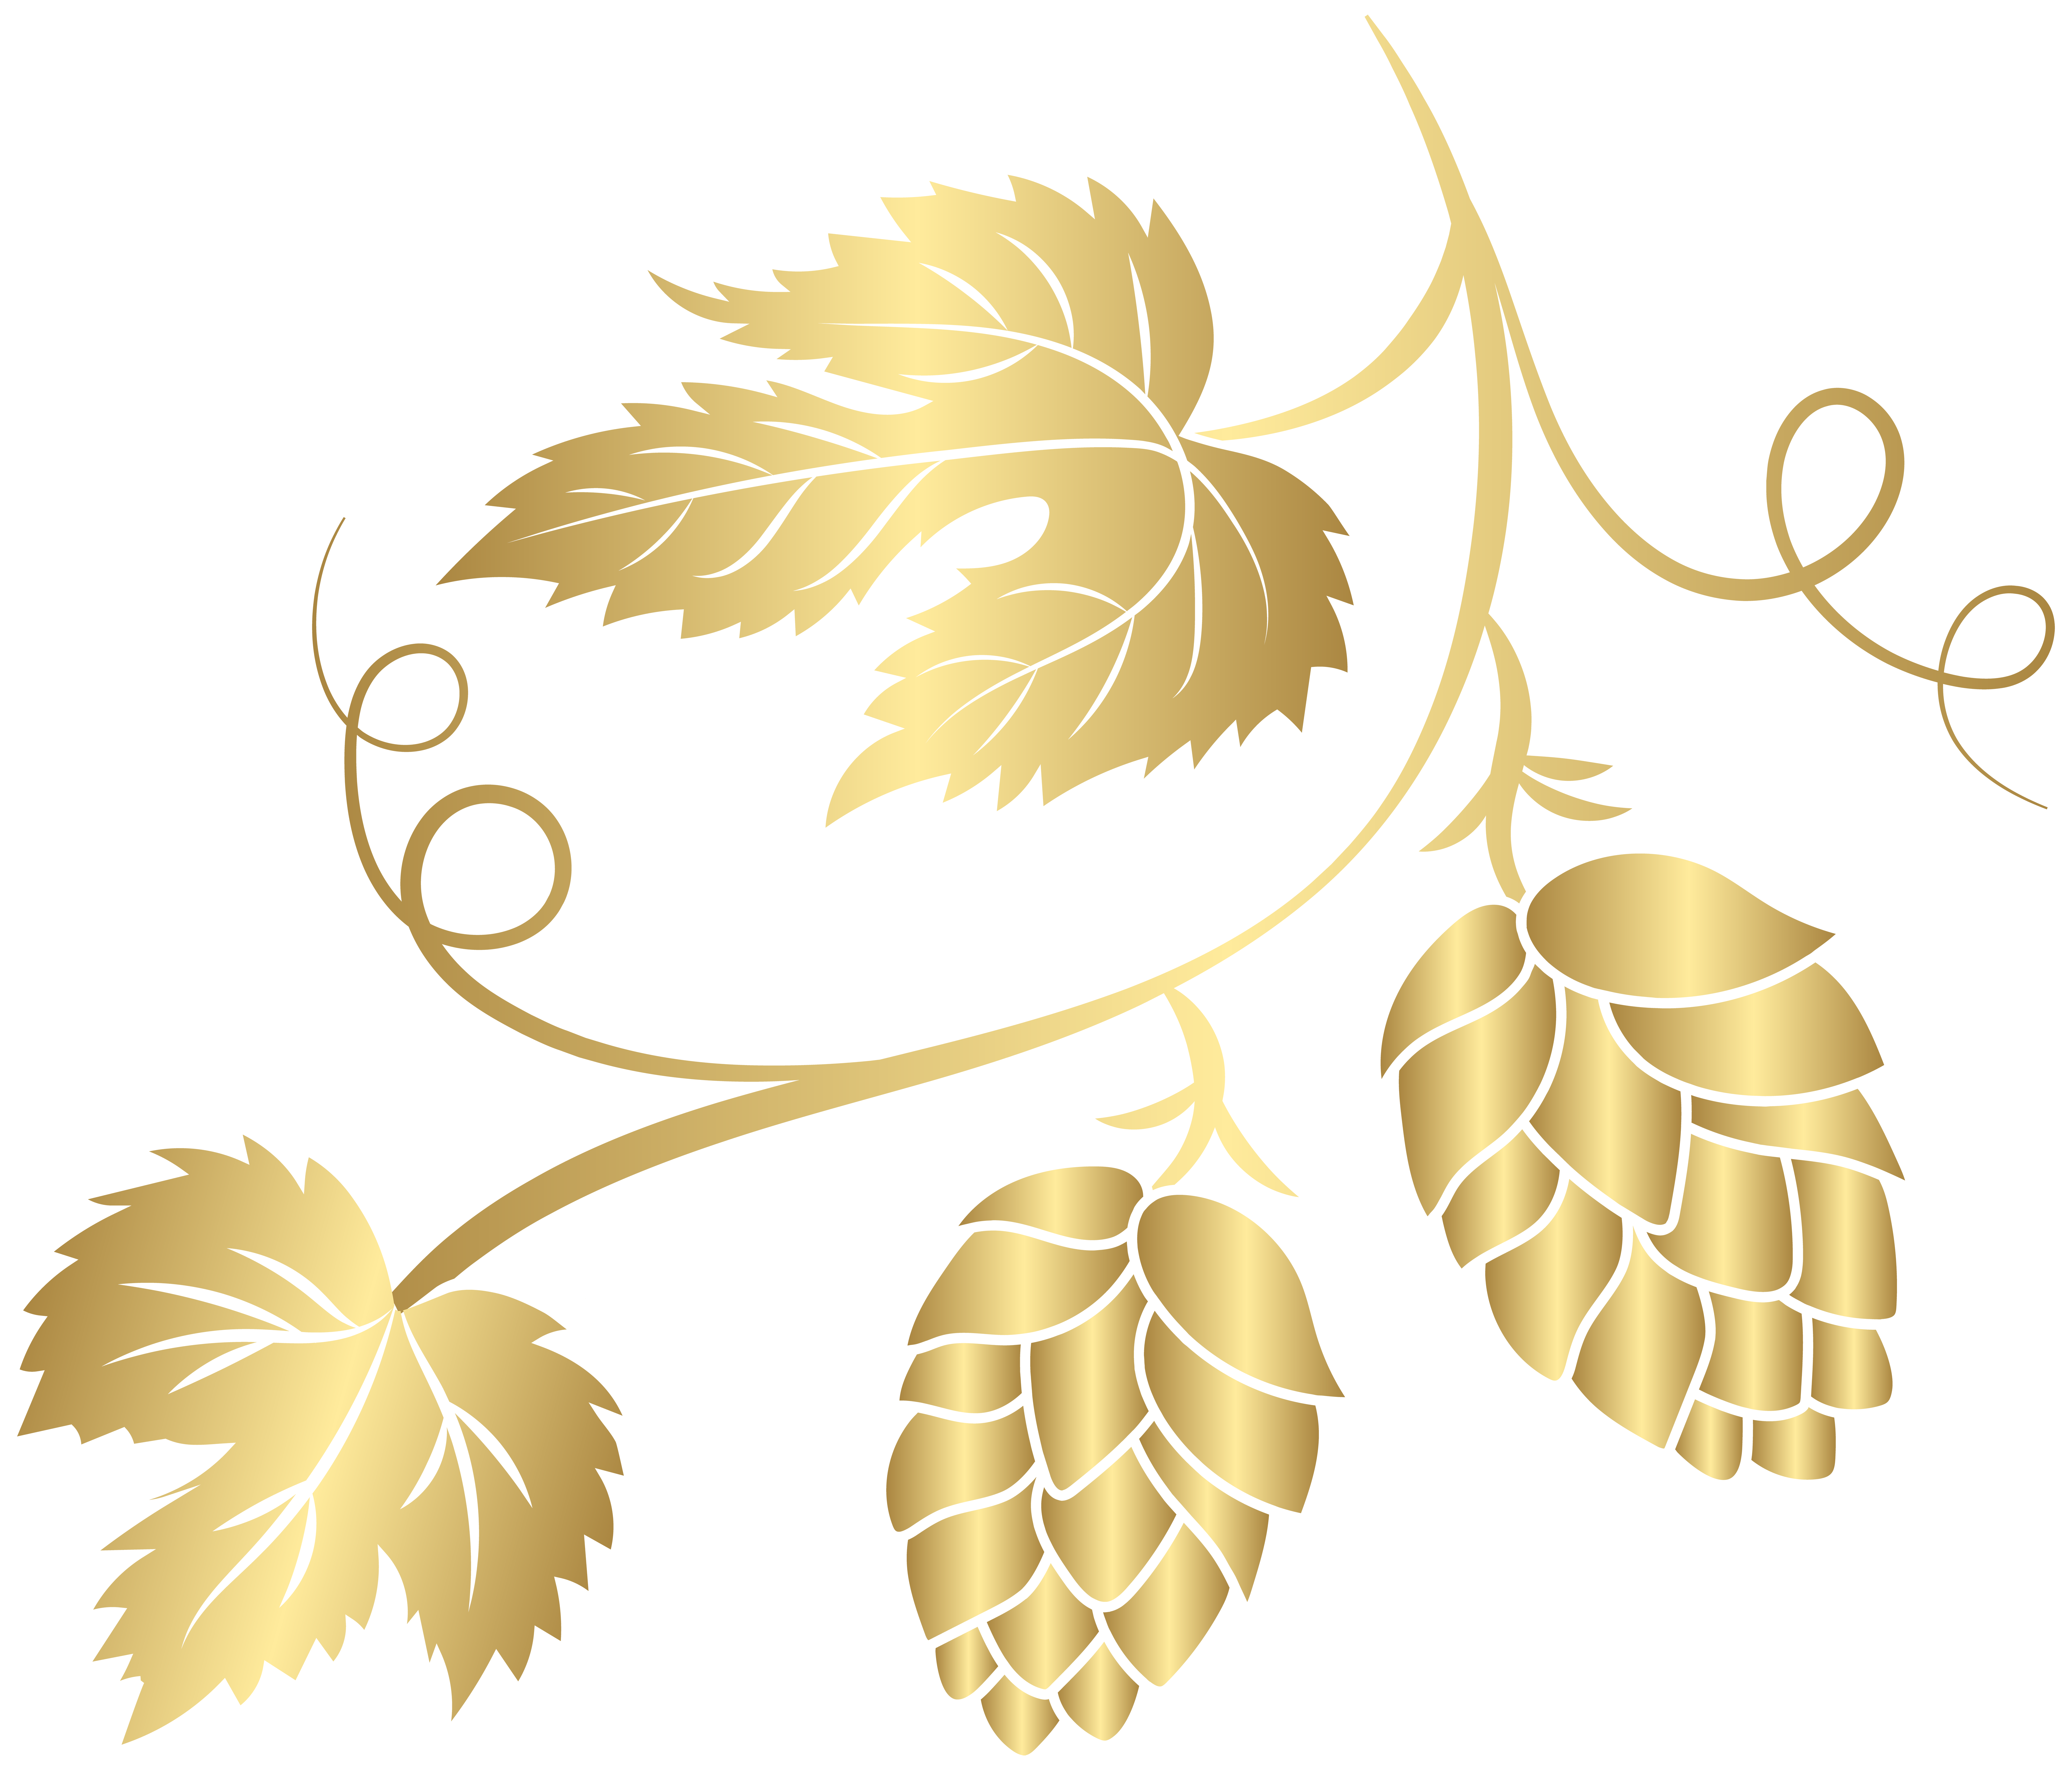 Gold Hop Transparent PNG Clip Art Image.